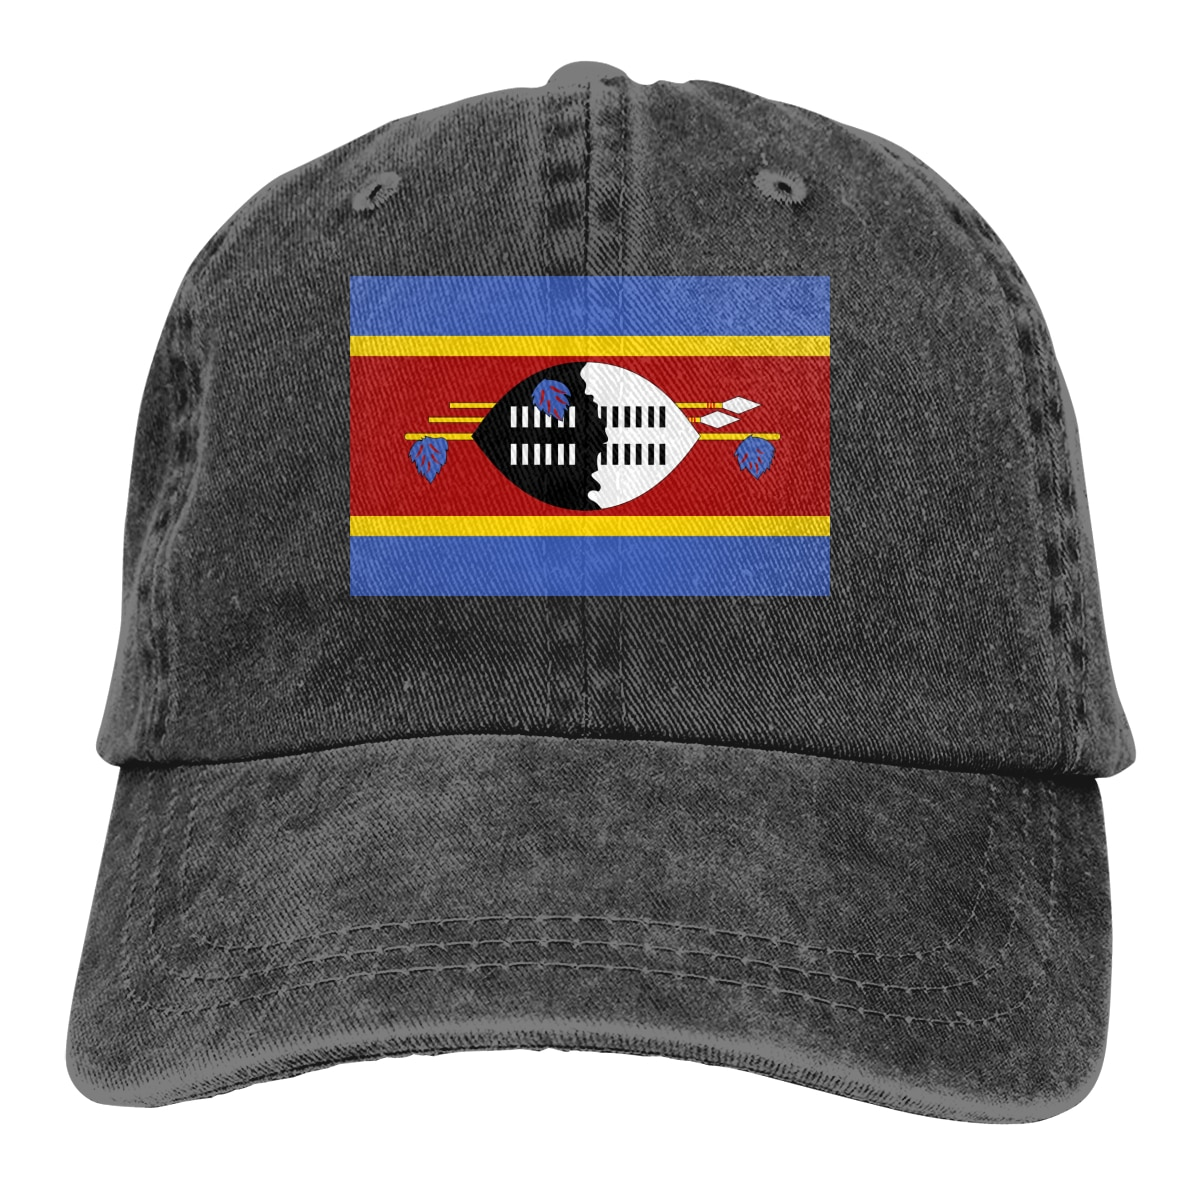 Swaziland flag Cowboy hat